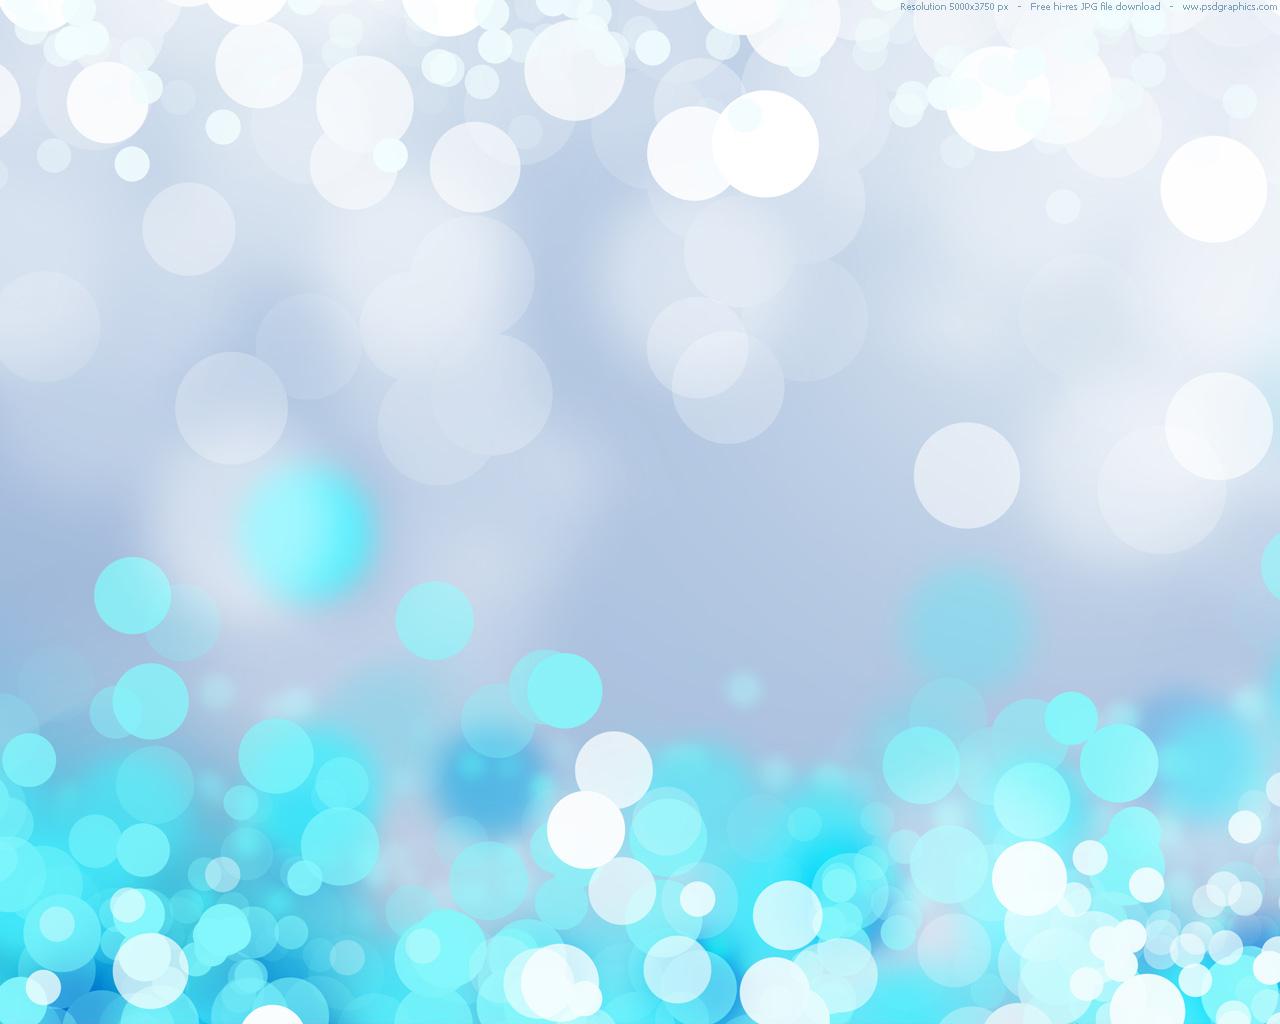 blurry-lights-background.jpg